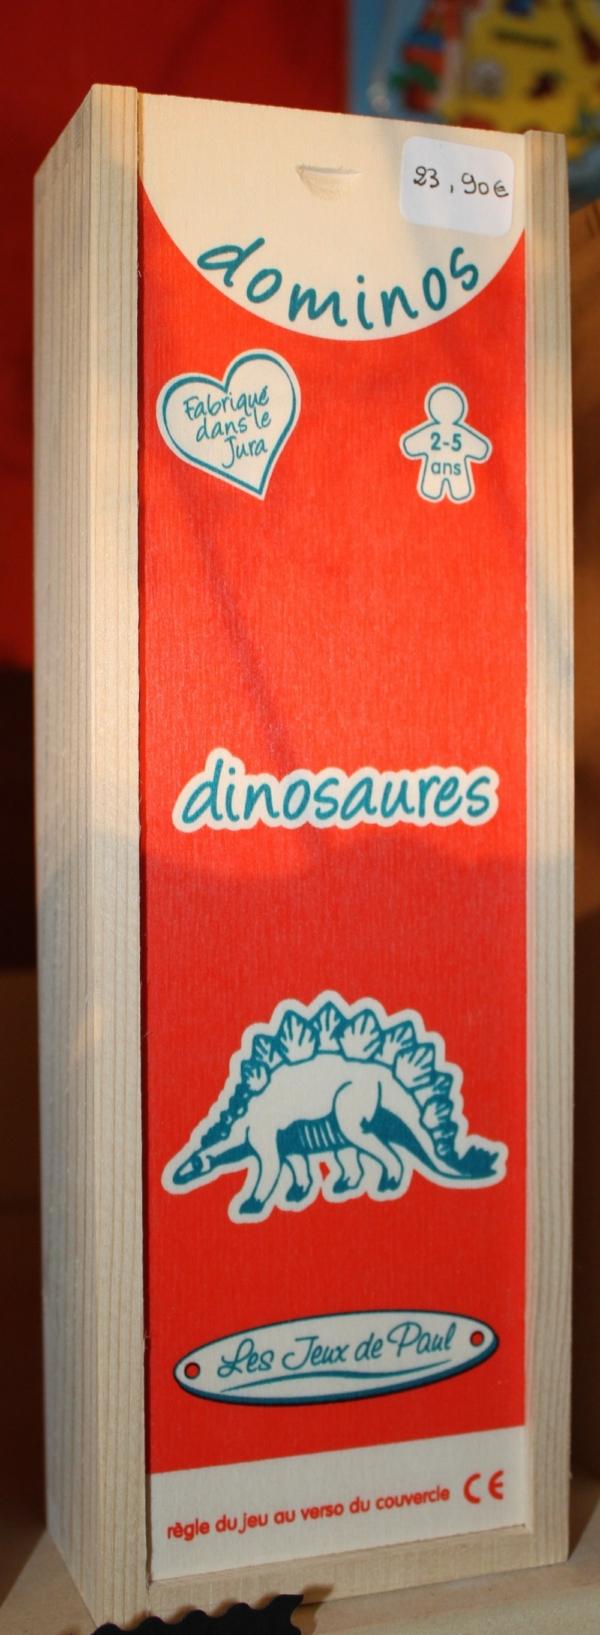 Dominos Dinosaures